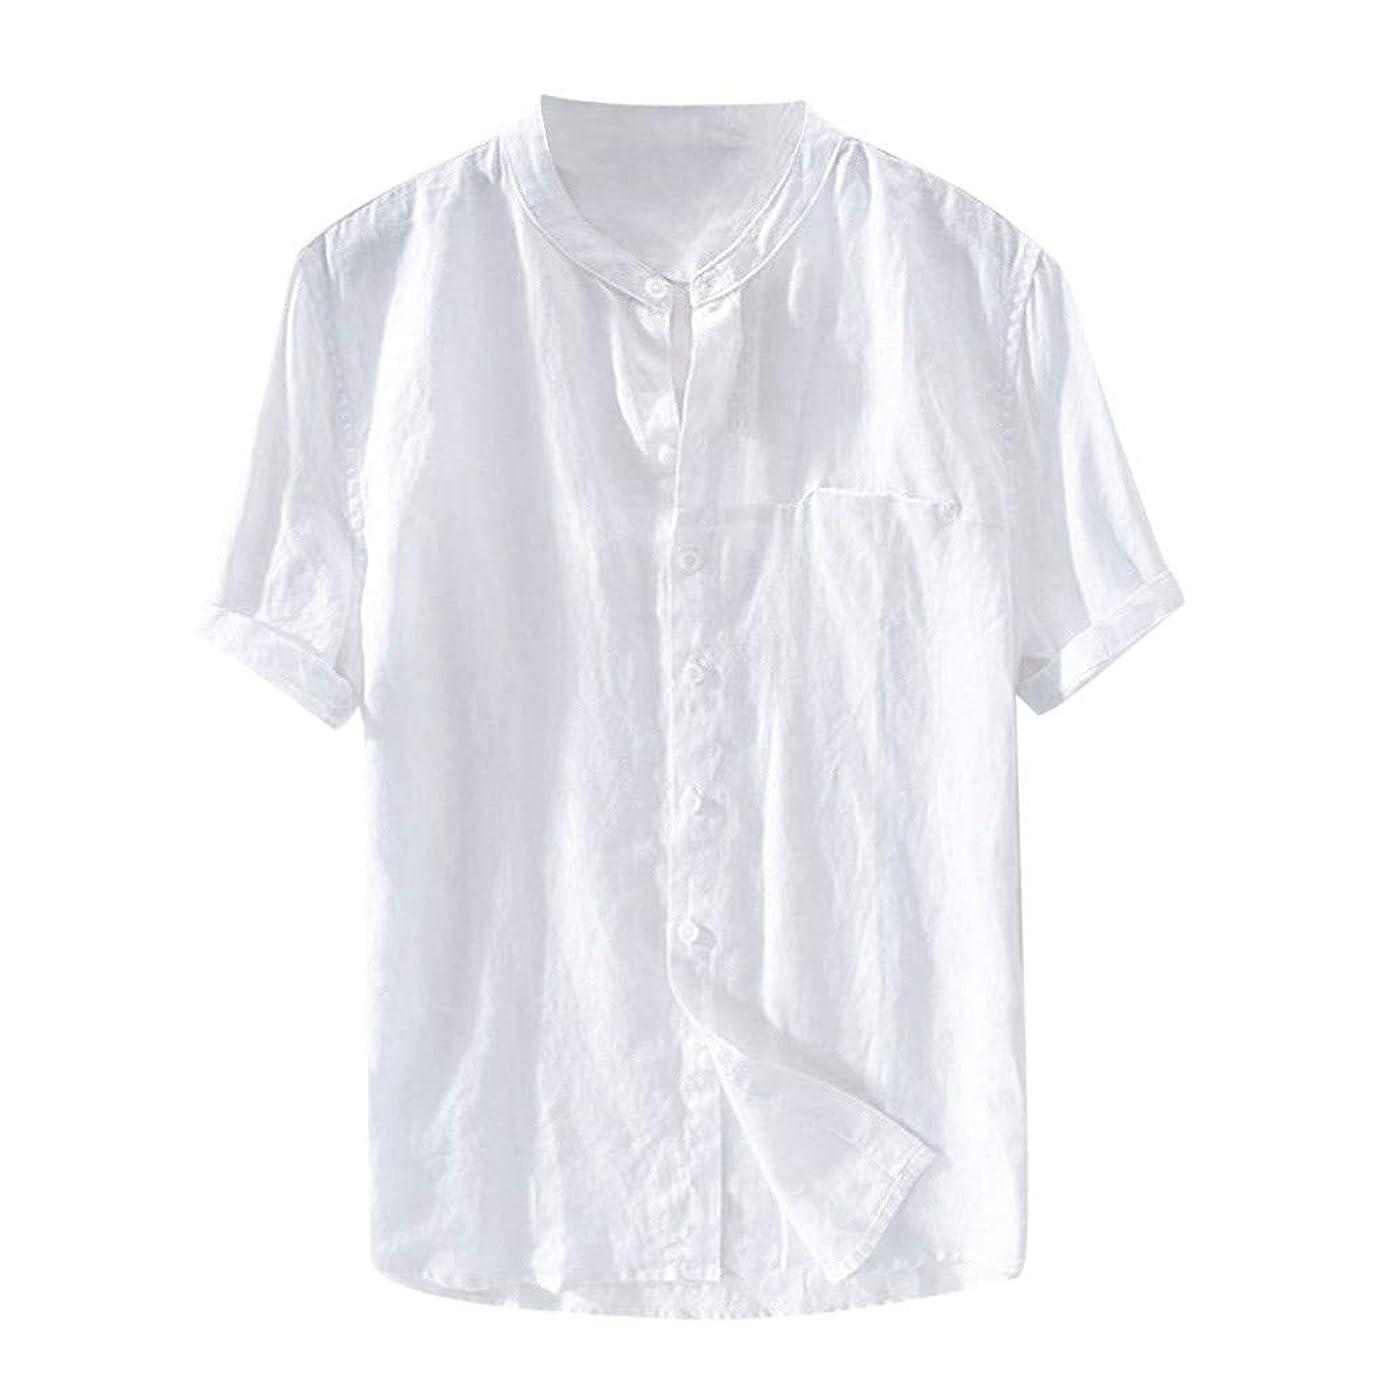 Beauty&YOP Mens Short Sleeve Shirts Linen Cotton Button Tees Spread Collar Plain Shirts